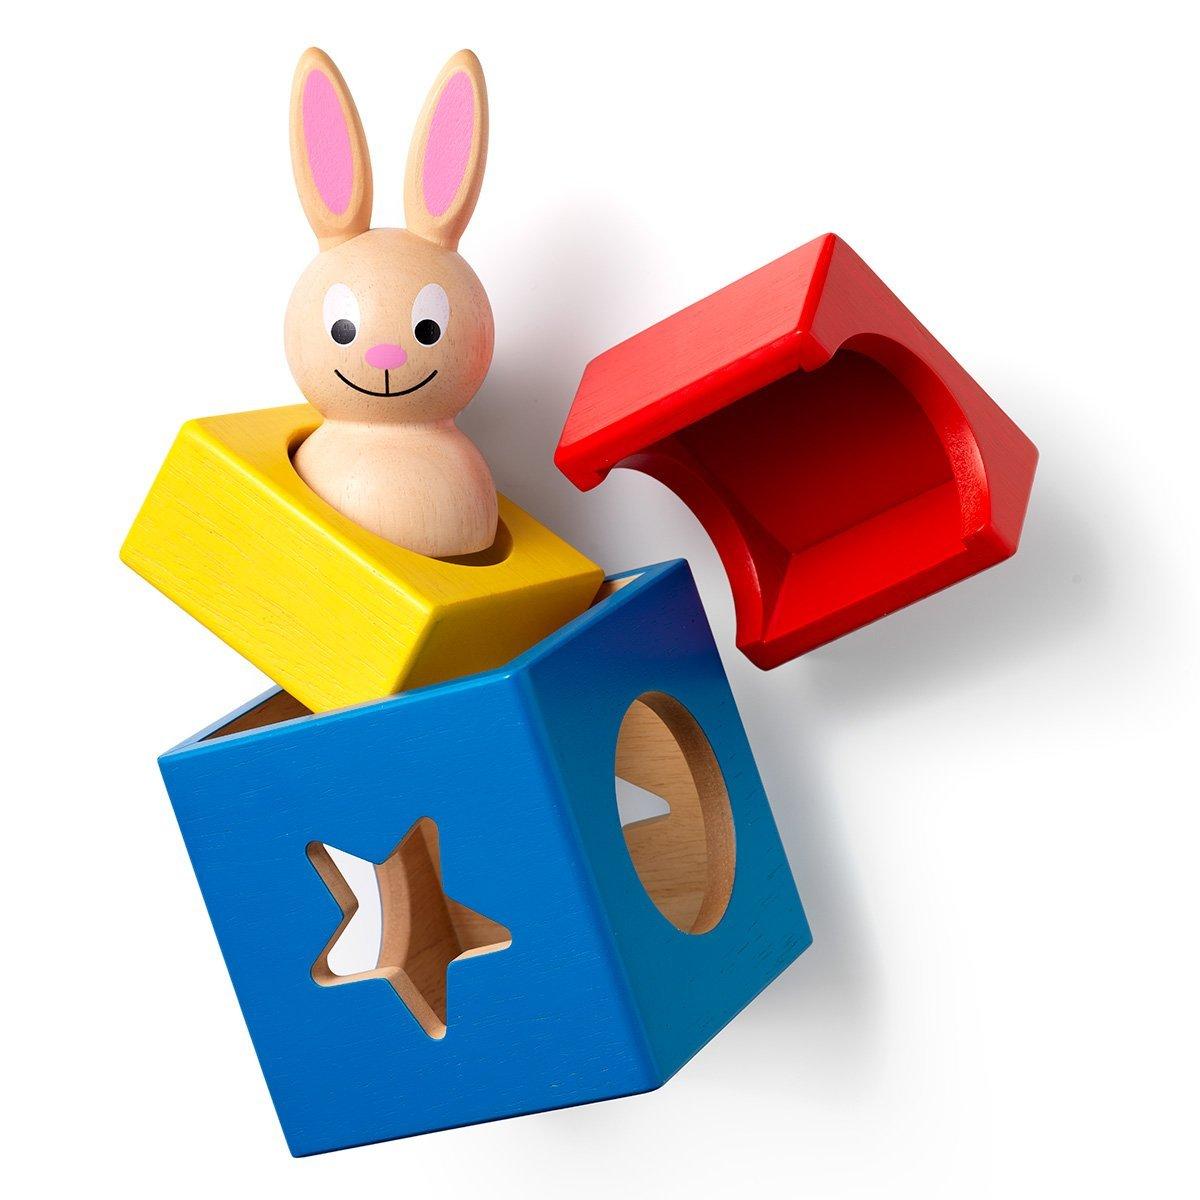 smart games Bunny boo儿童桌游三只小猪smart car睡美人益智玩具